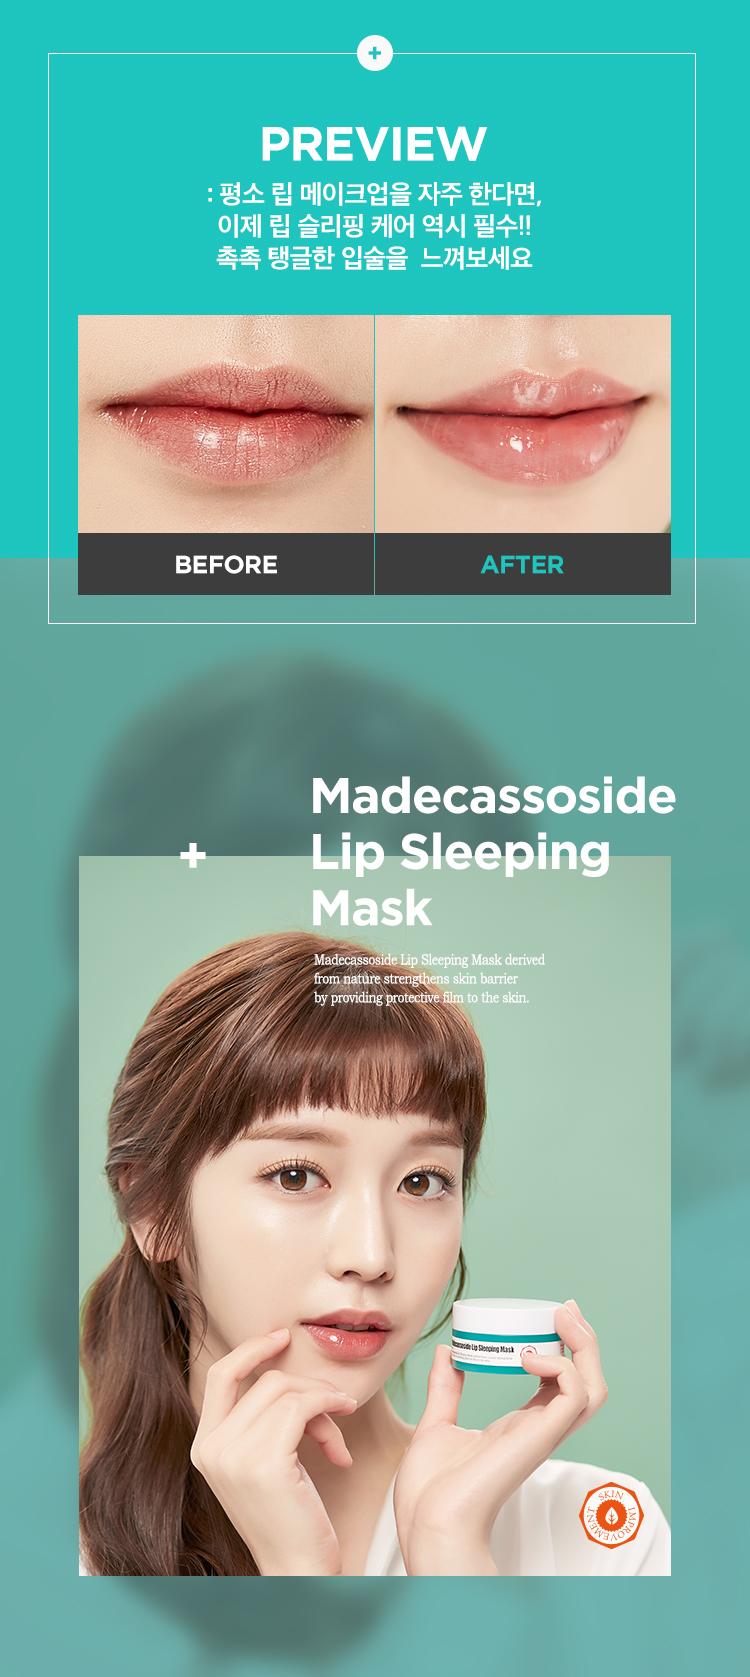 APIEU_Madecassoside_Lip_SleepingMask_02.jpg